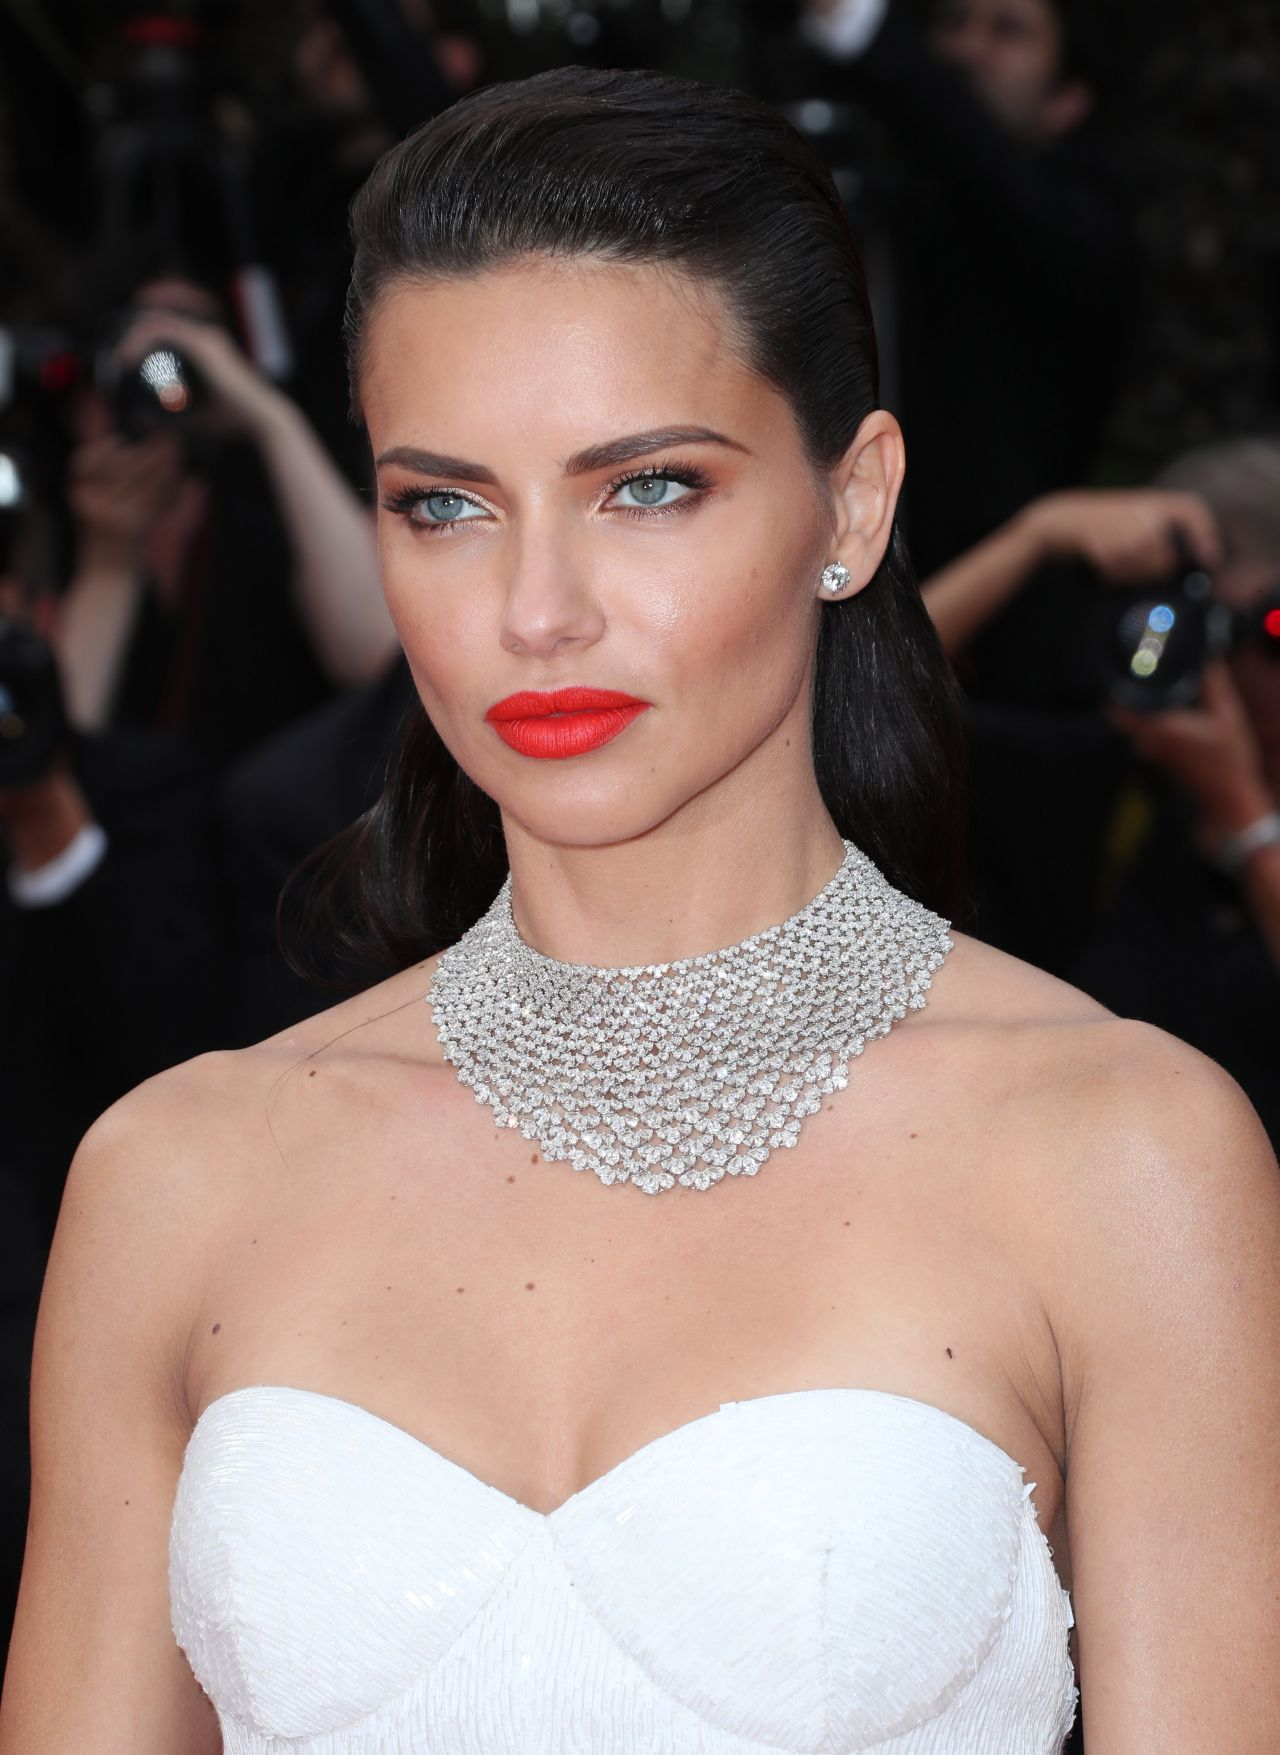 Cannes Film Festival Fashion Show